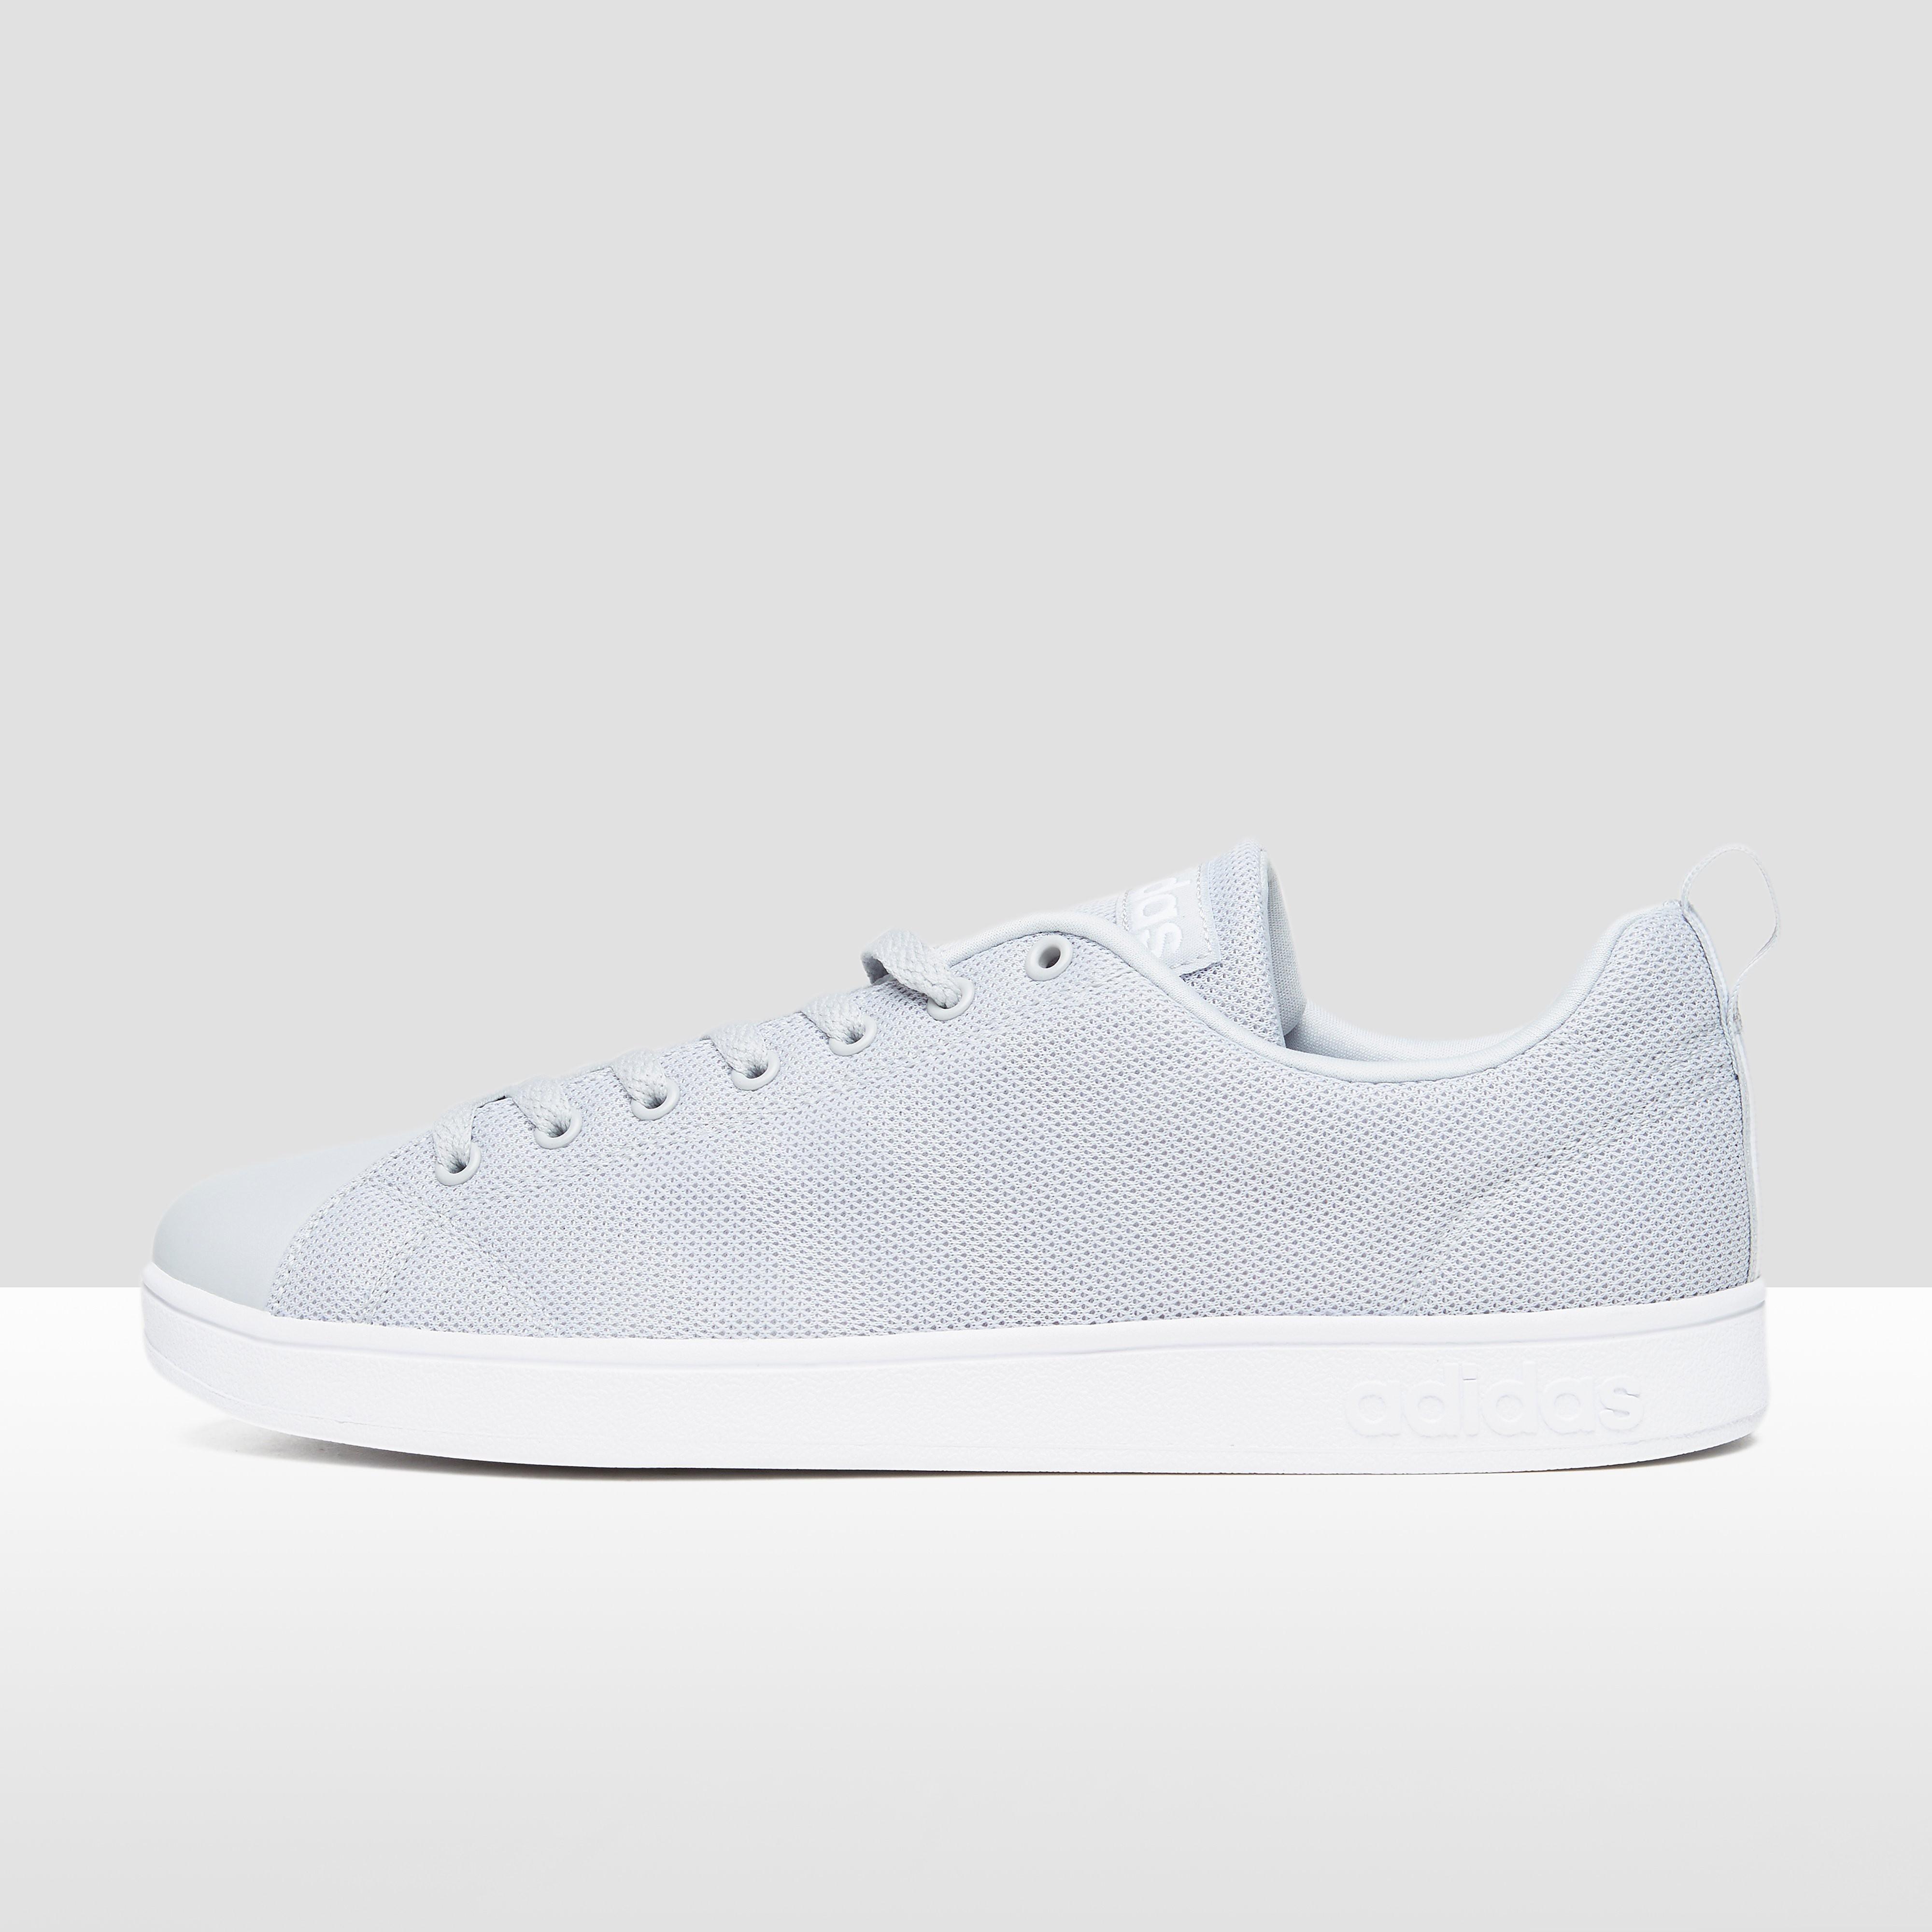 Adidas - ADVANTAGE CLEAN VS SNEAKERS HEREN